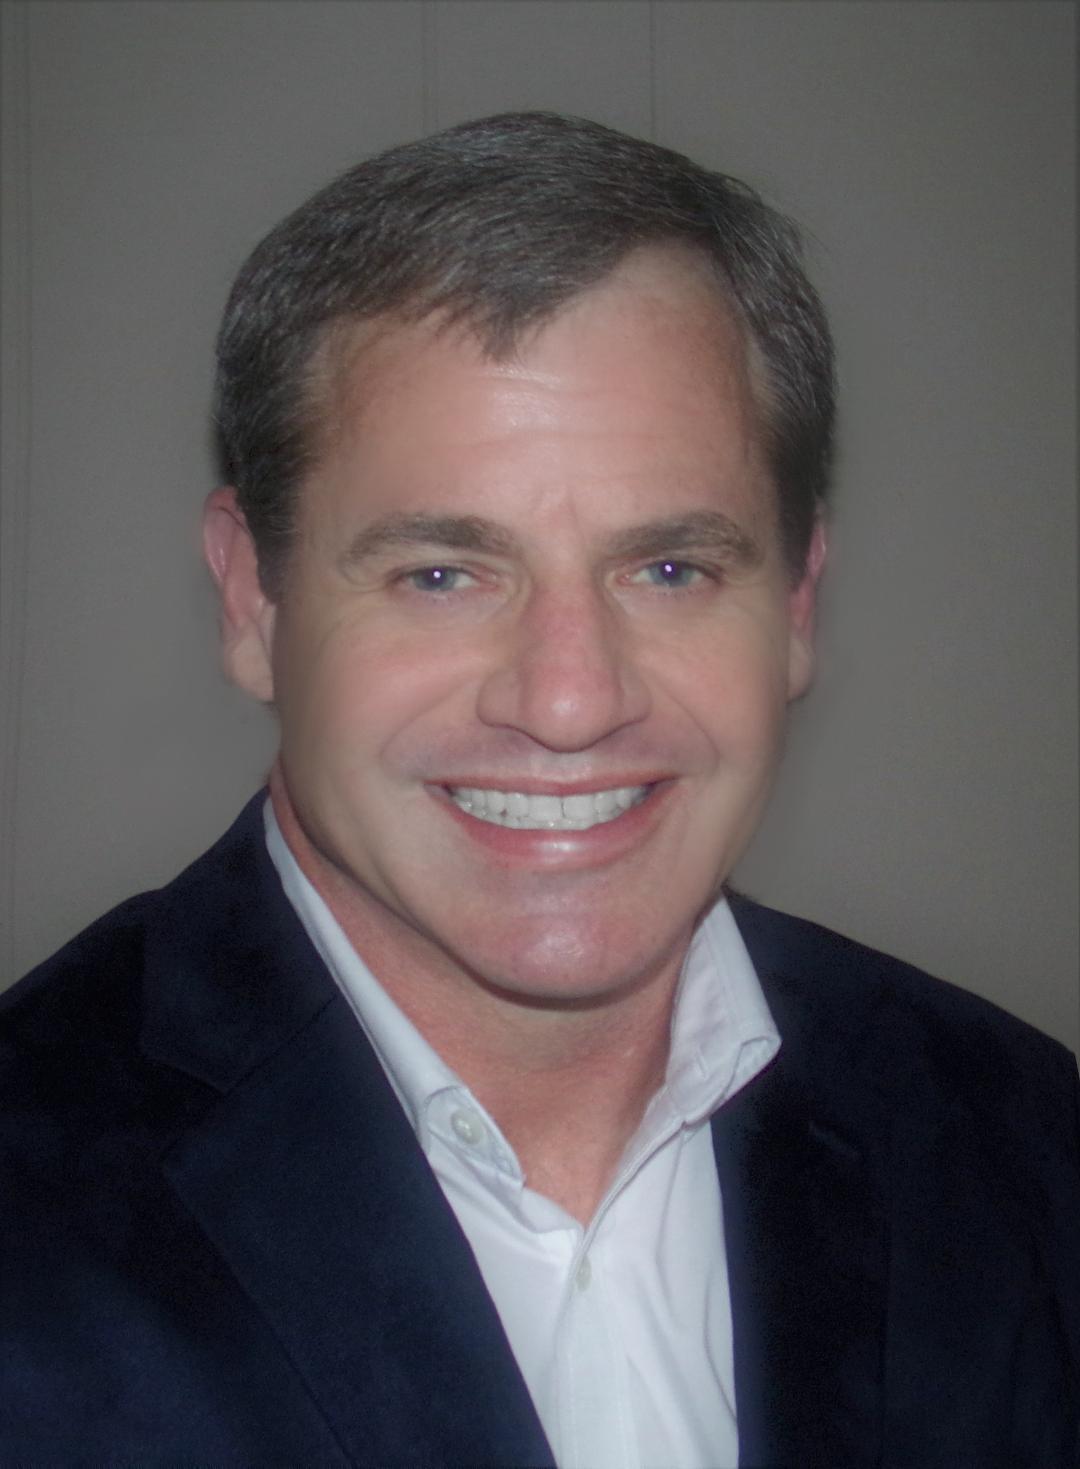 Timothy Dobbs